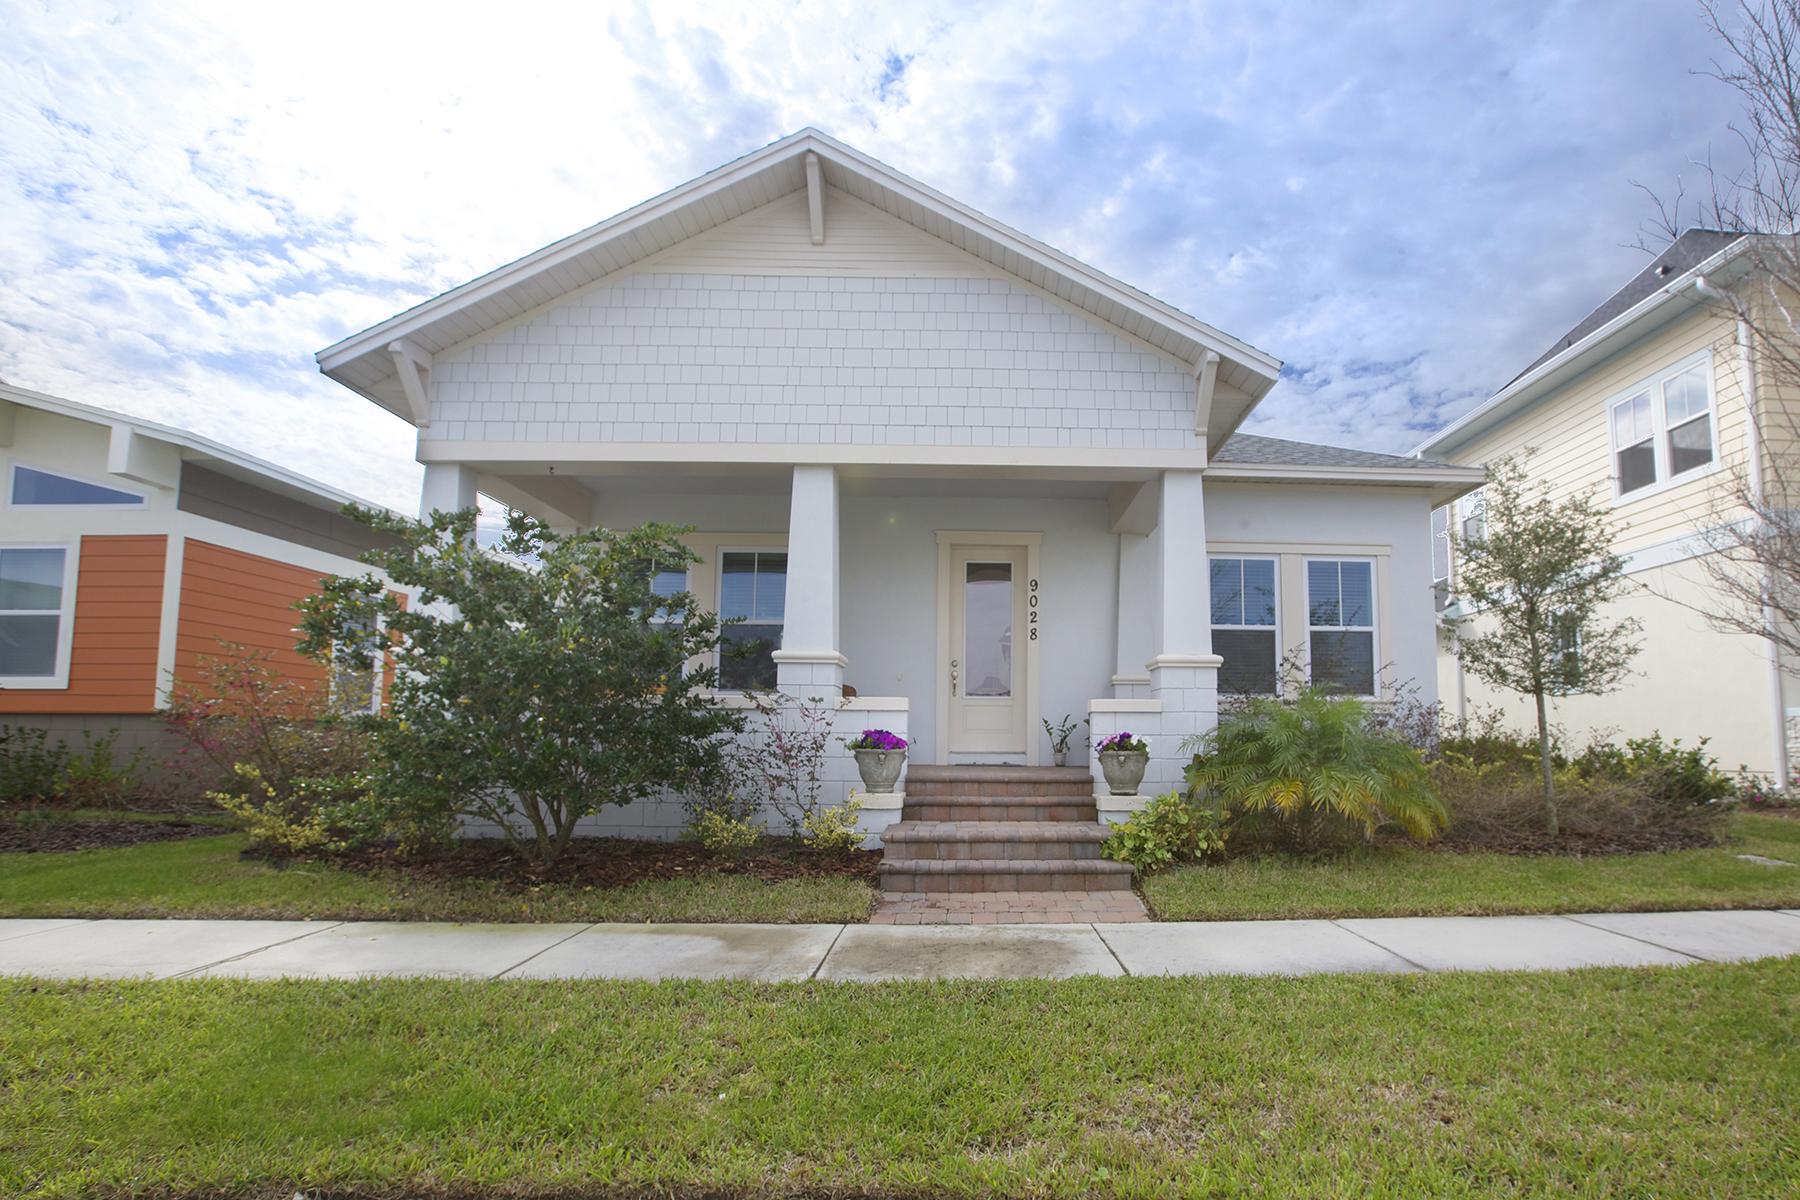 Single Family Home for Sale at ORLANDO 9028 Yonath St, Orlando, Florida 32827 United States